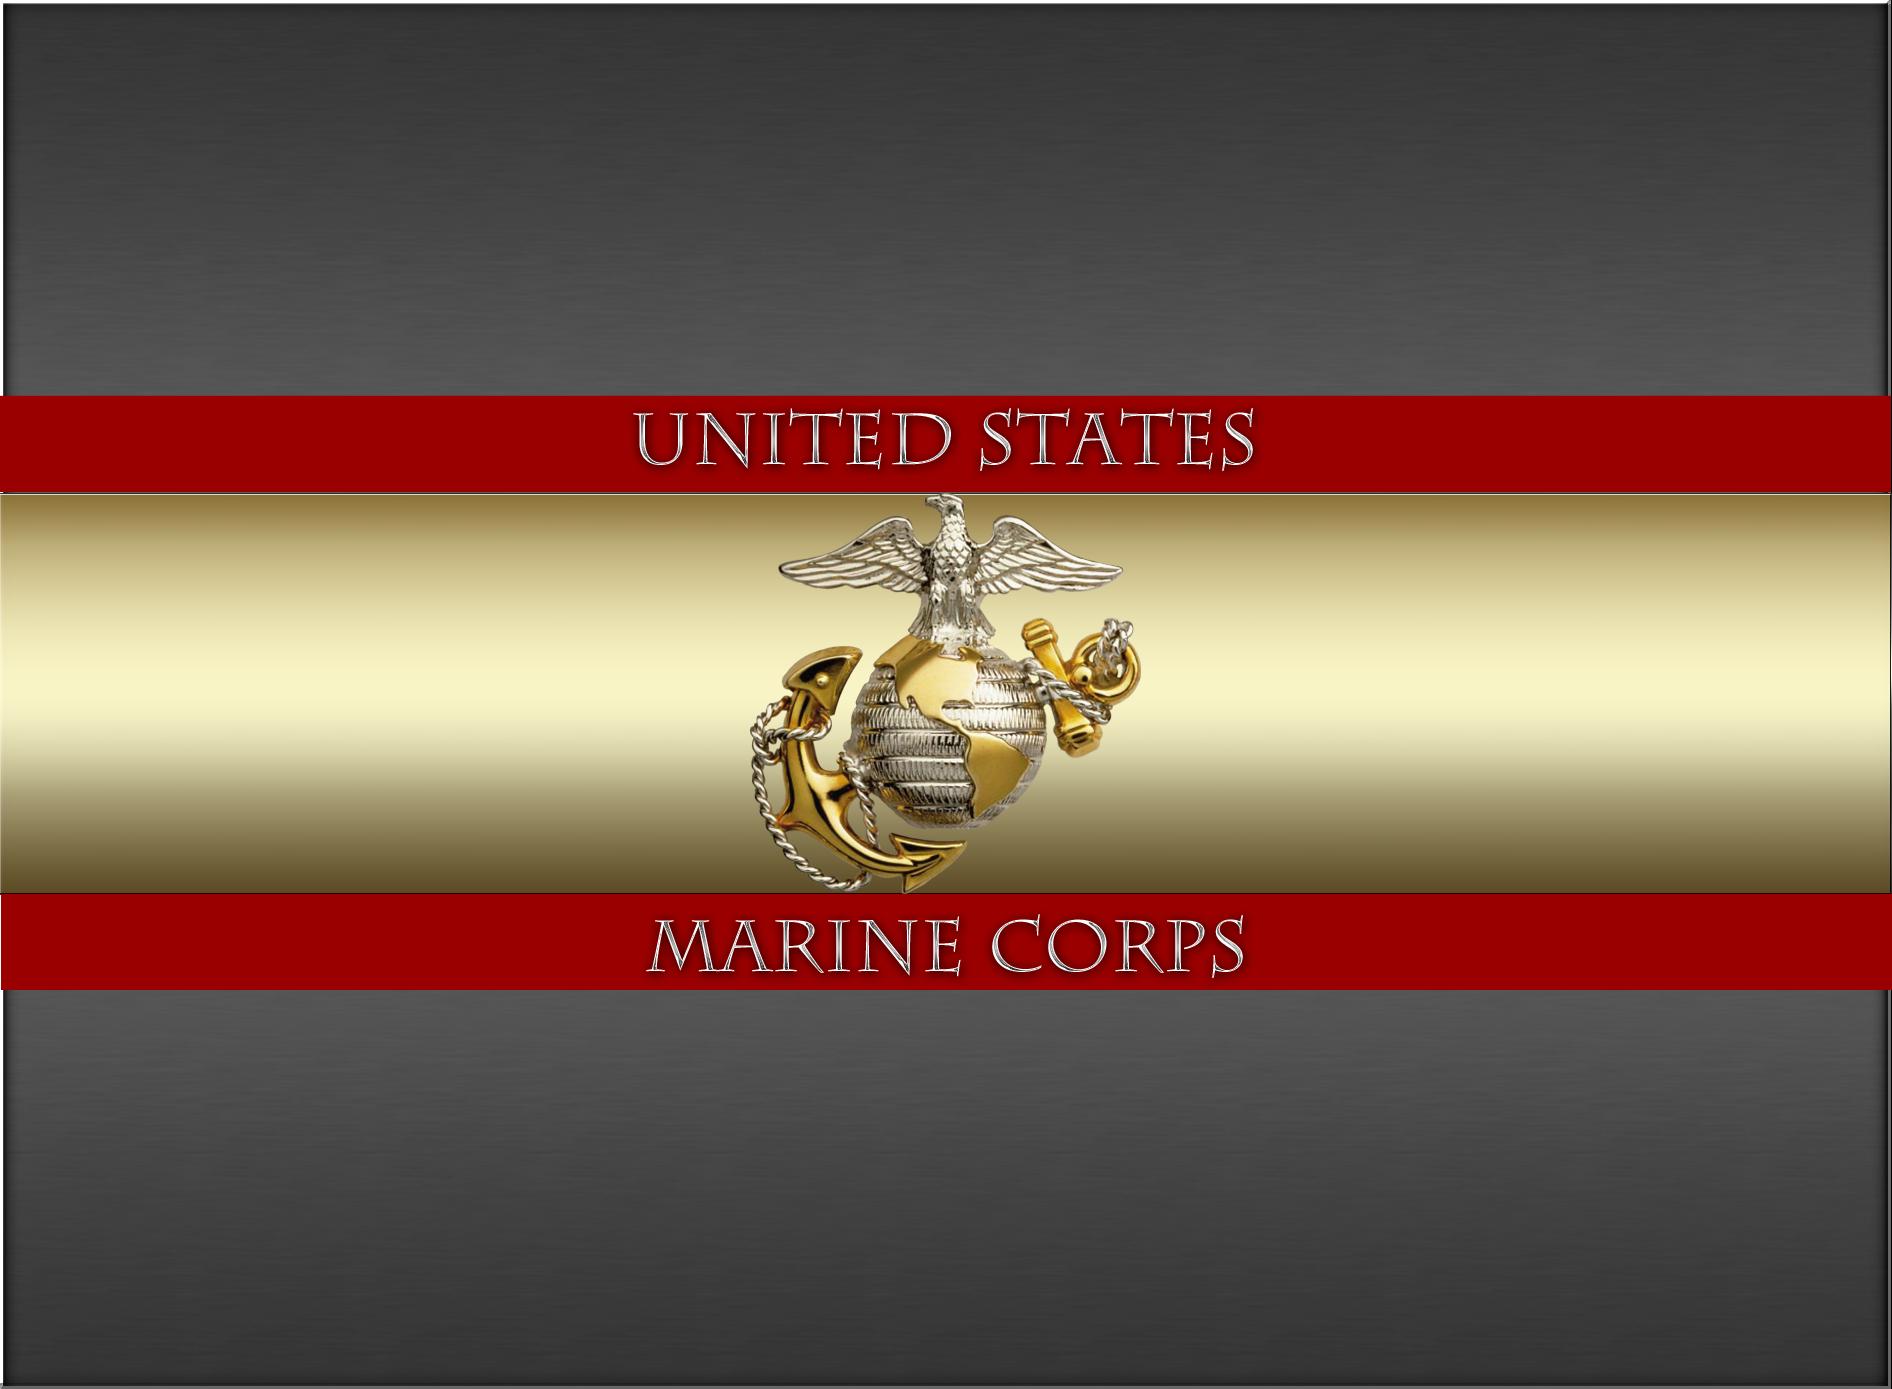 Us Marine Corps wallpaper 90265 1892x1389